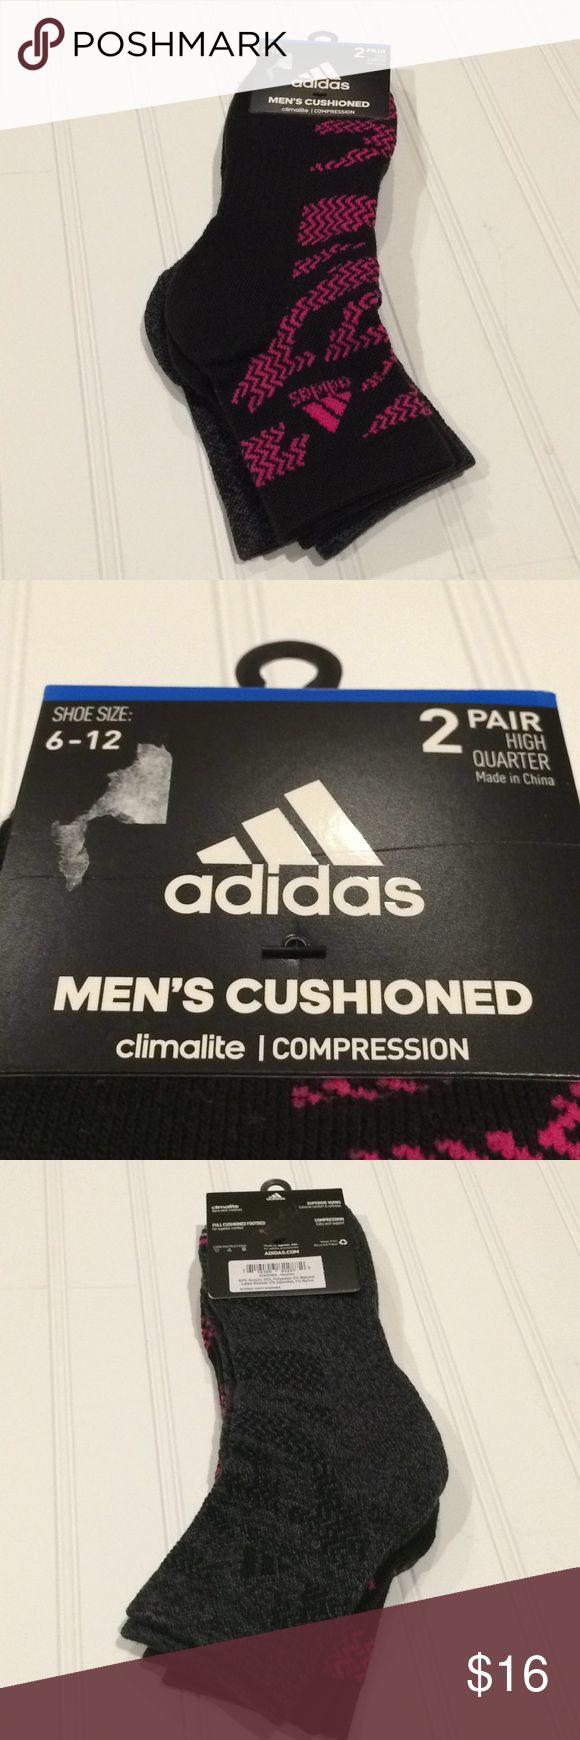 Adidas men's cushioned socks Climalite-Compression-Full cushioned footbed-High quarter socks adidas Underwear & Socks Athletic Socks